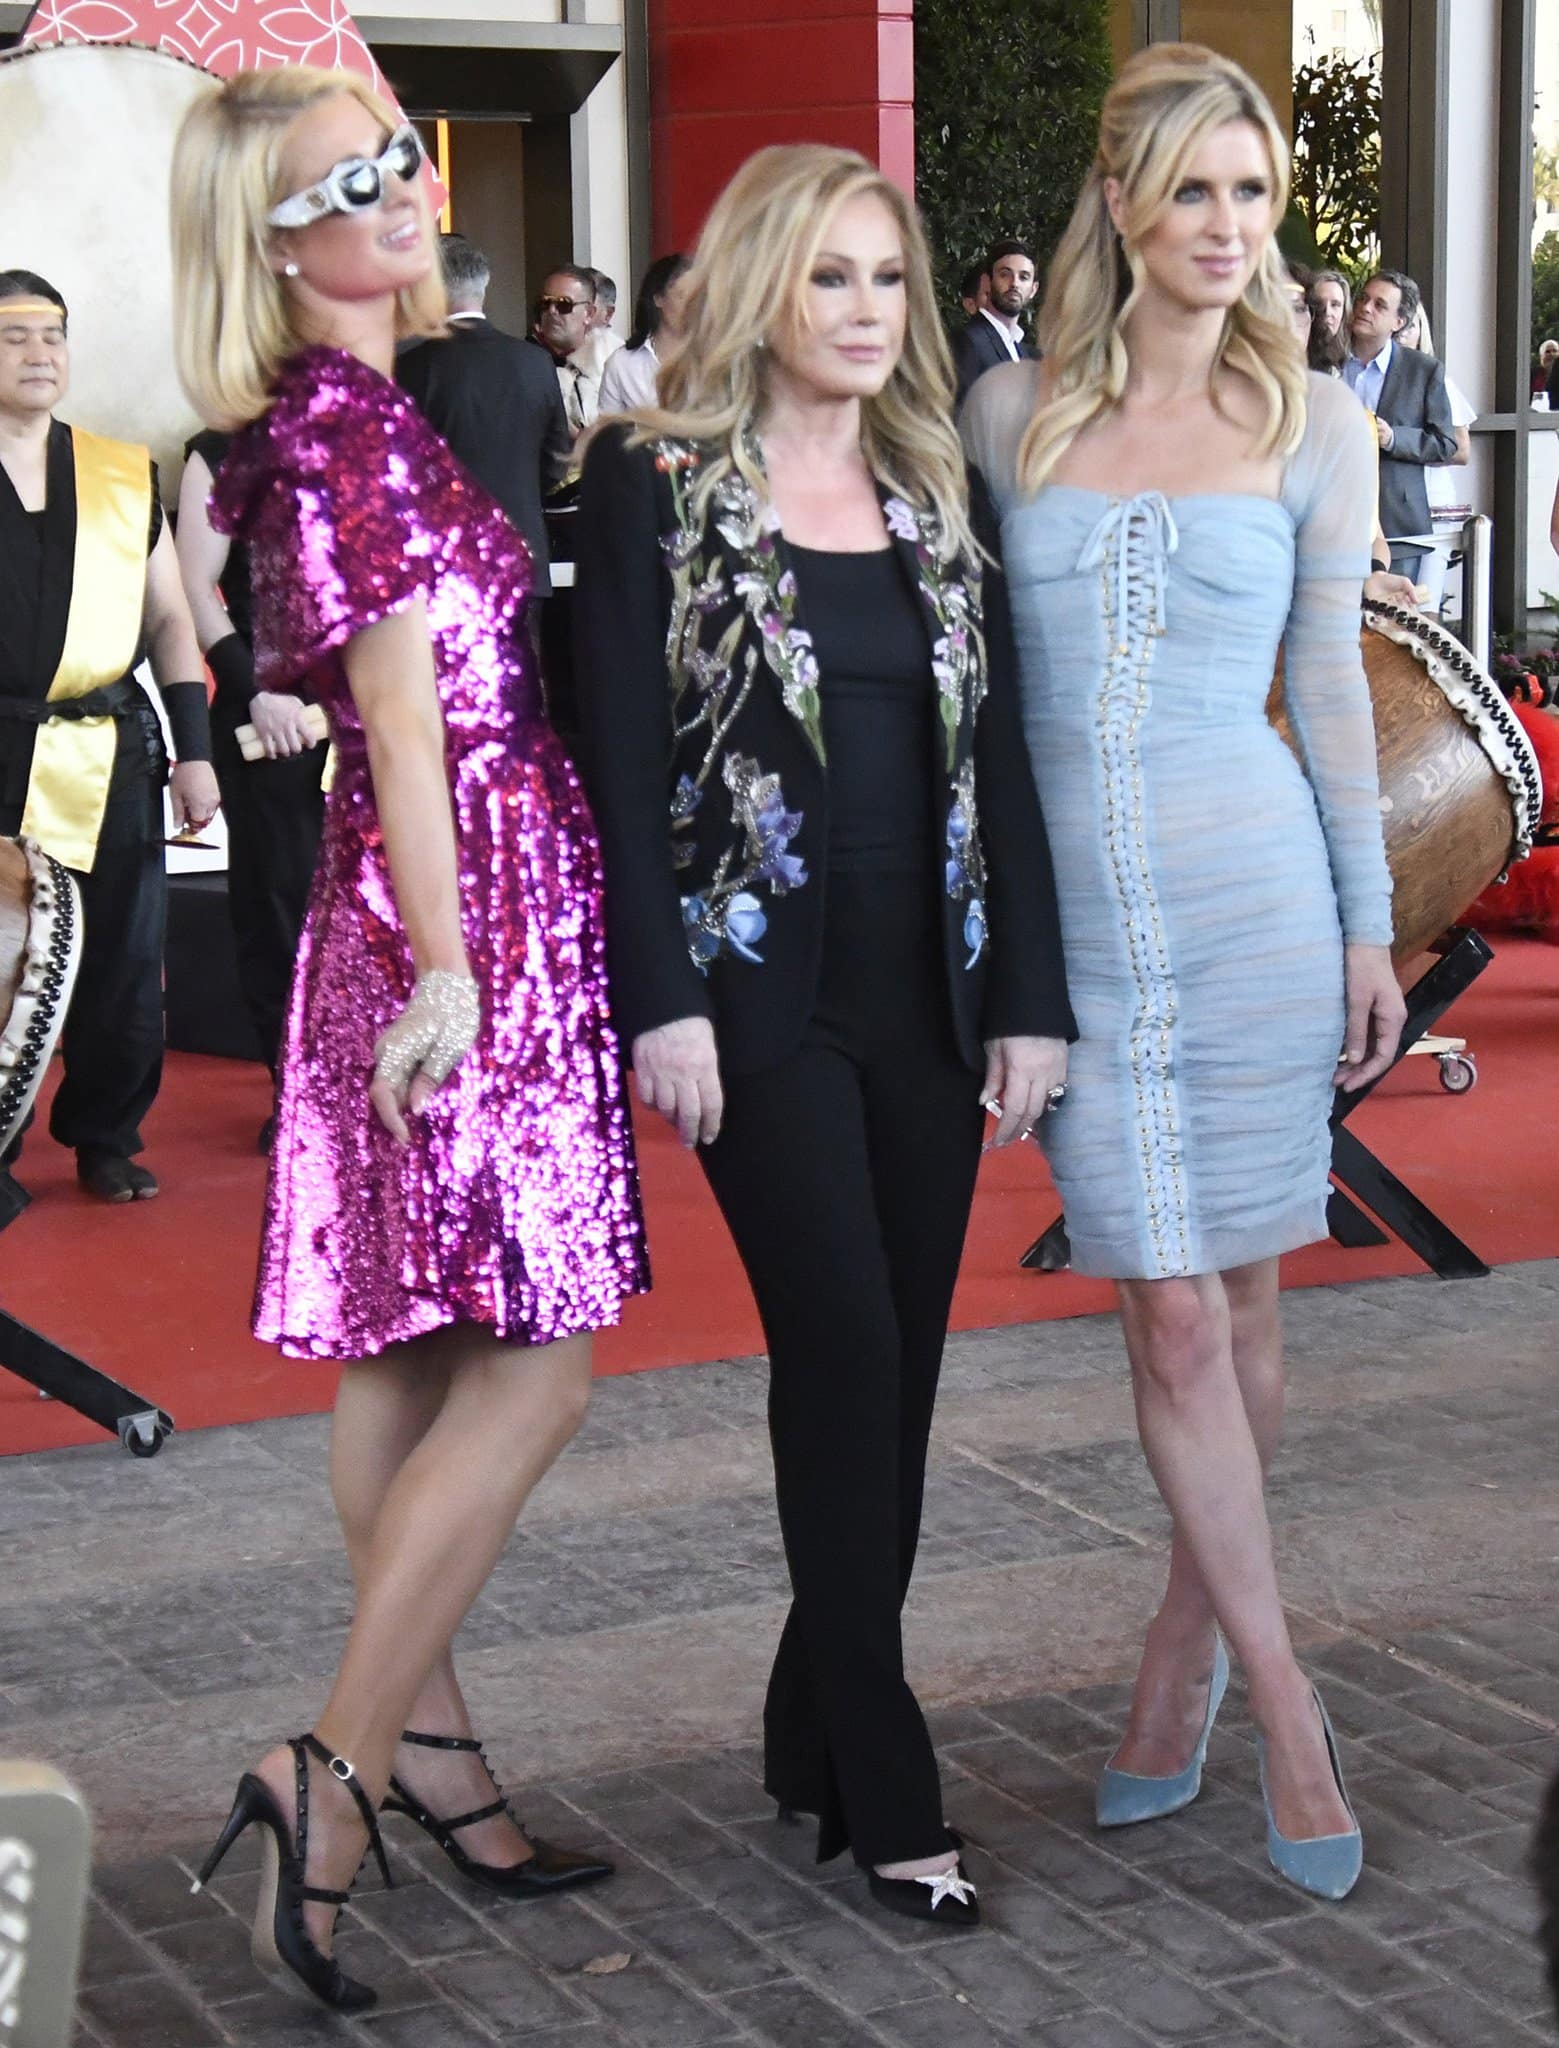 Nicky Hilton wears an understated light blue sheer corset-style dress from Dolce & Gabbana